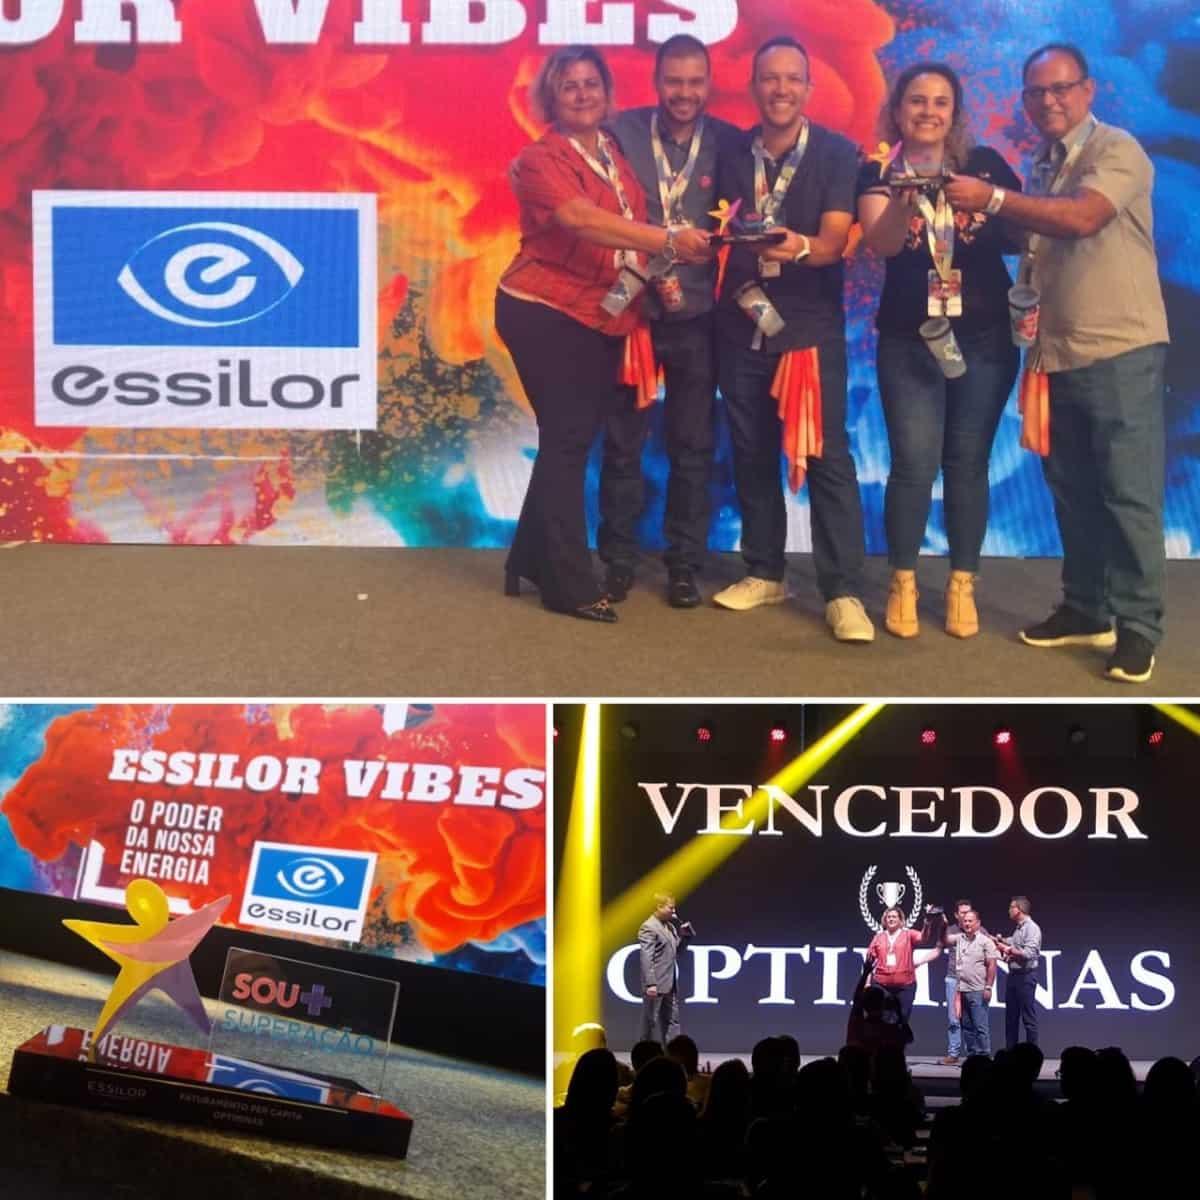 ESSILOR VIBES - 21/01/2019